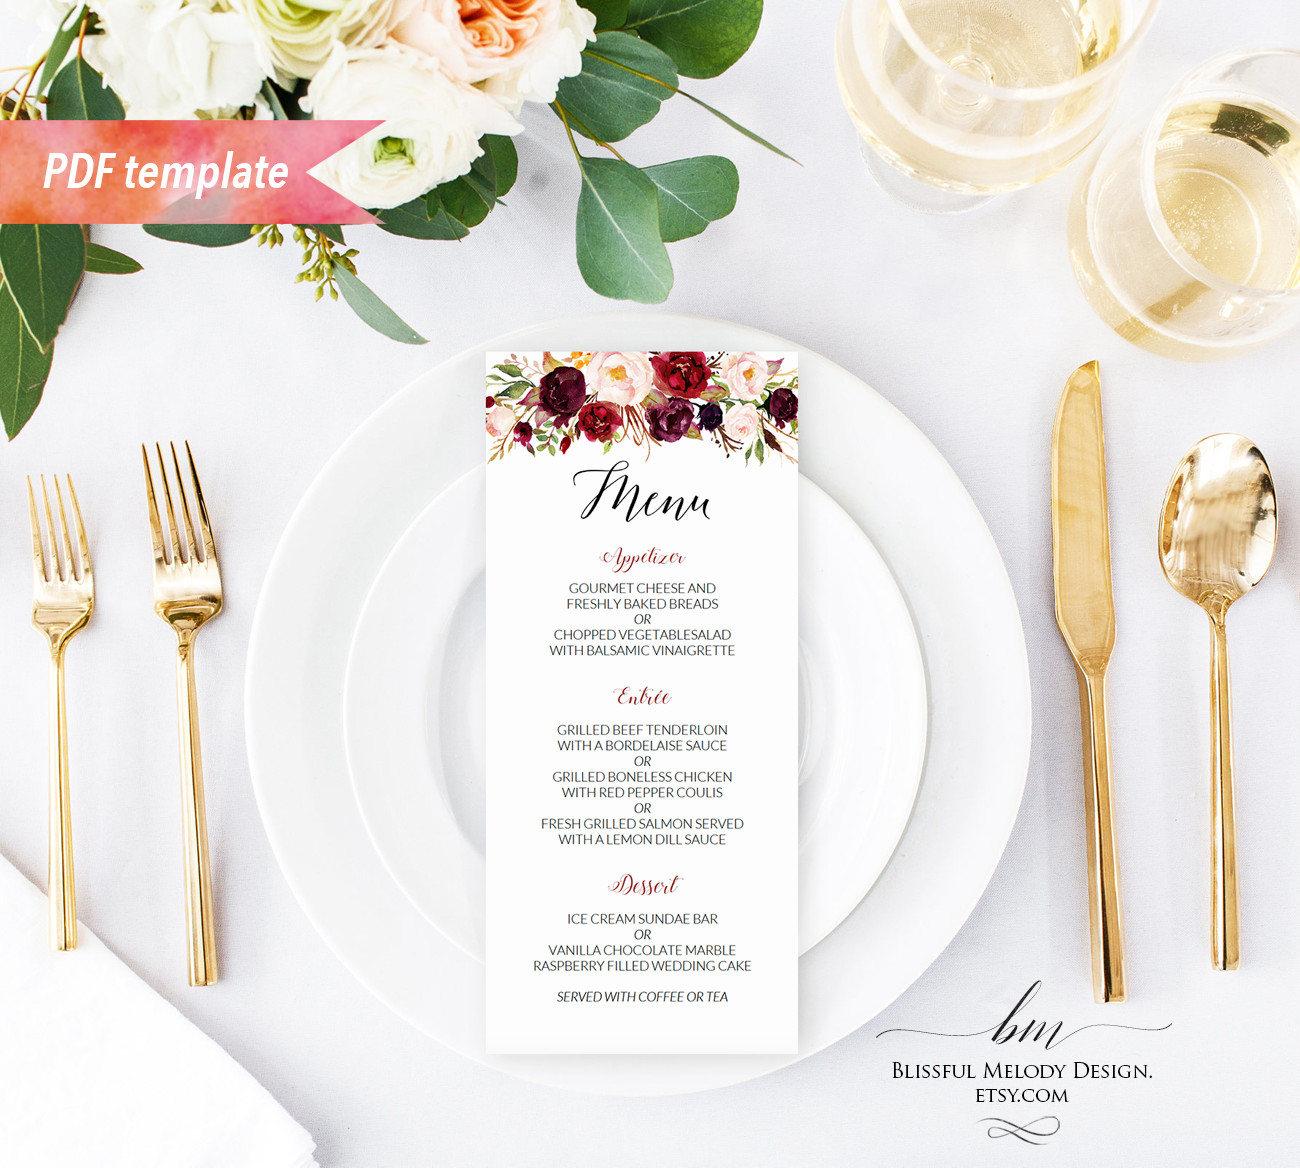 printable burgundy floral wedding menu editable pdf. Black Bedroom Furniture Sets. Home Design Ideas